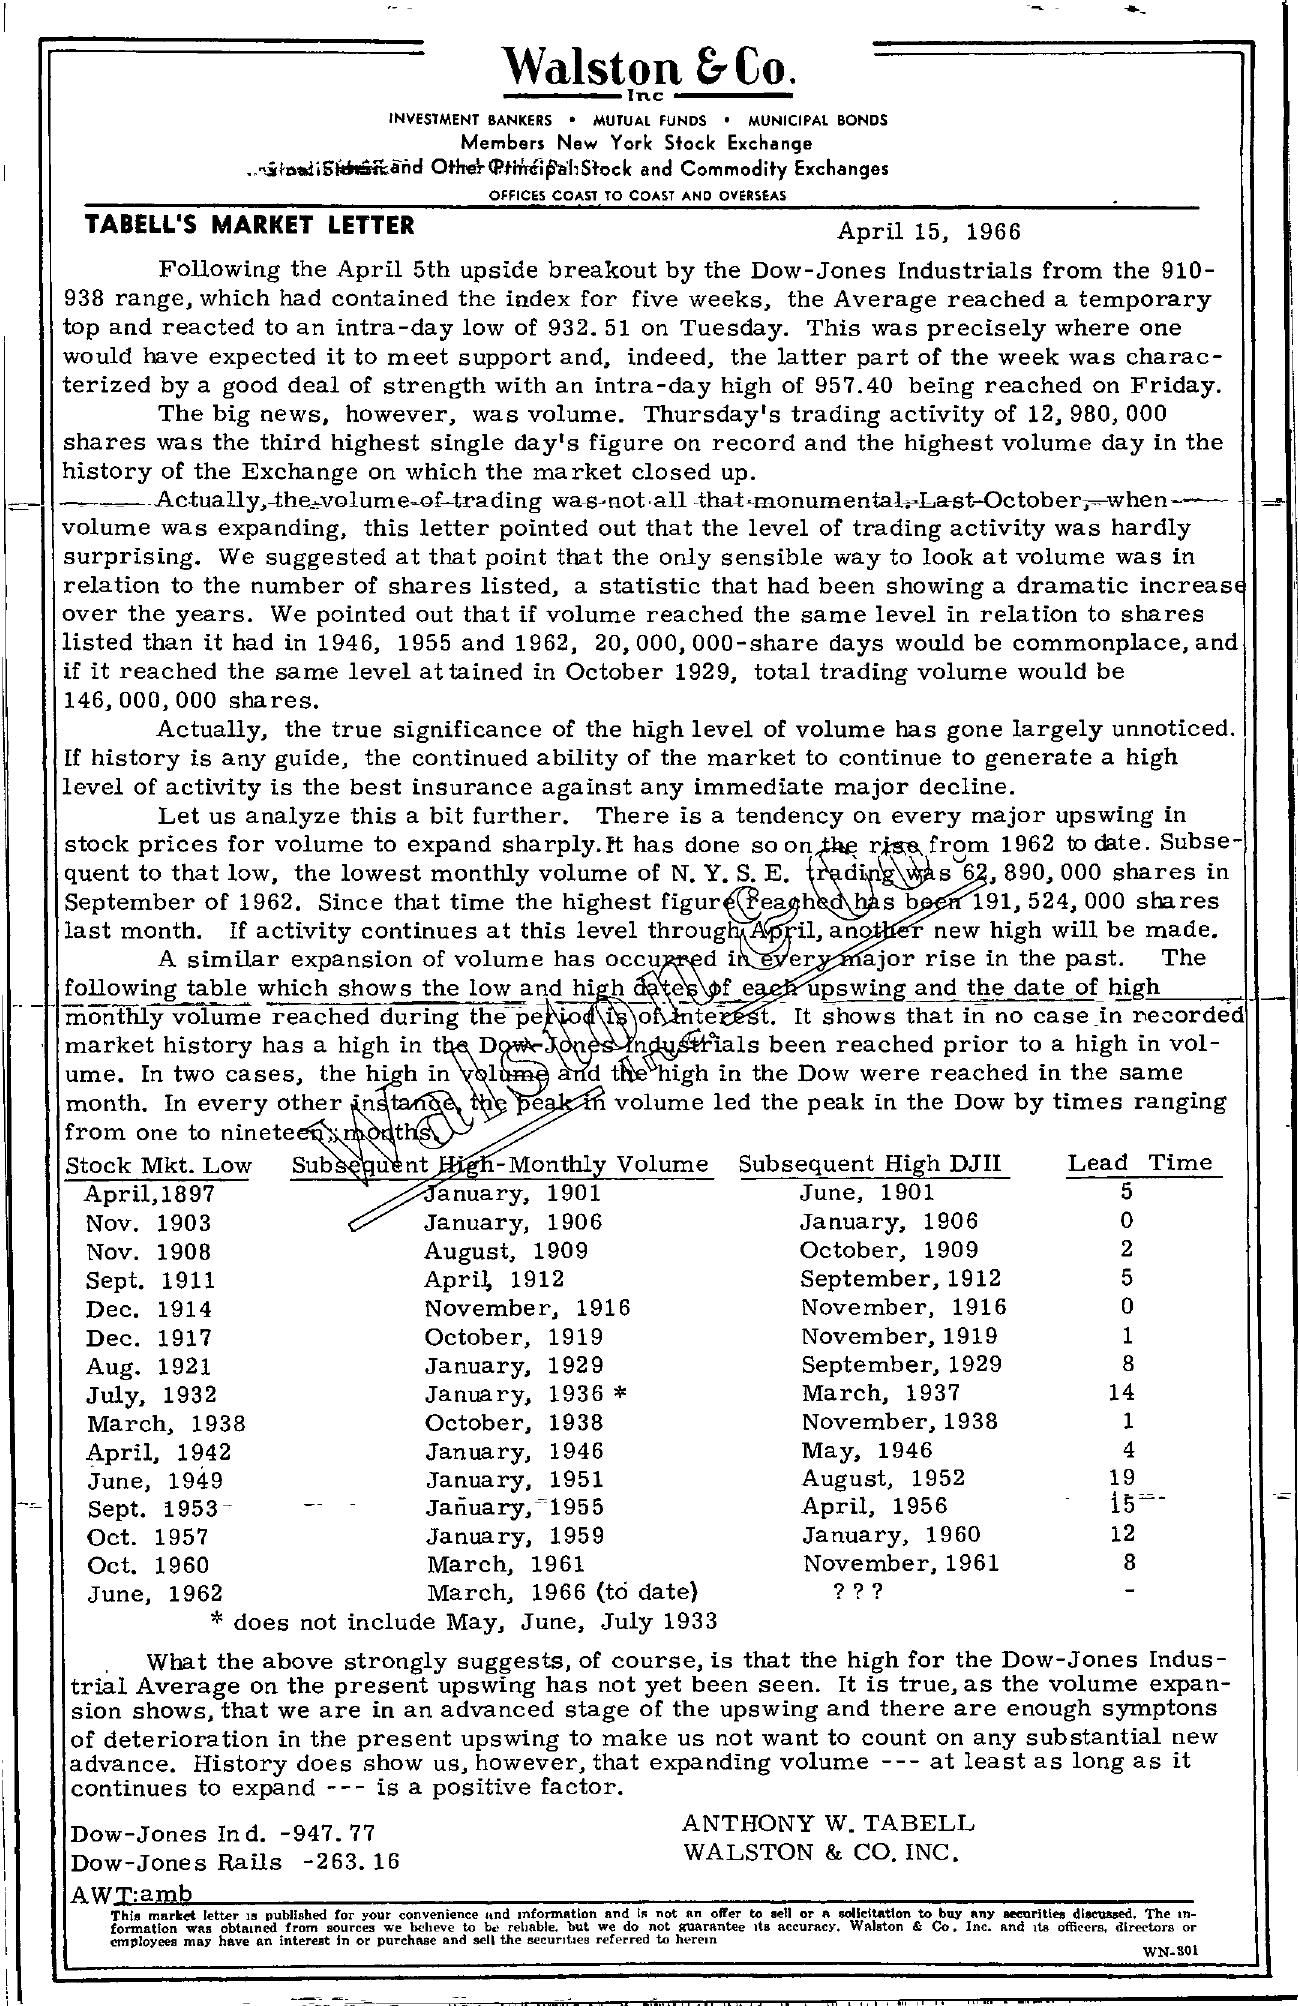 Tabell's Market Letter - April 15, 1966